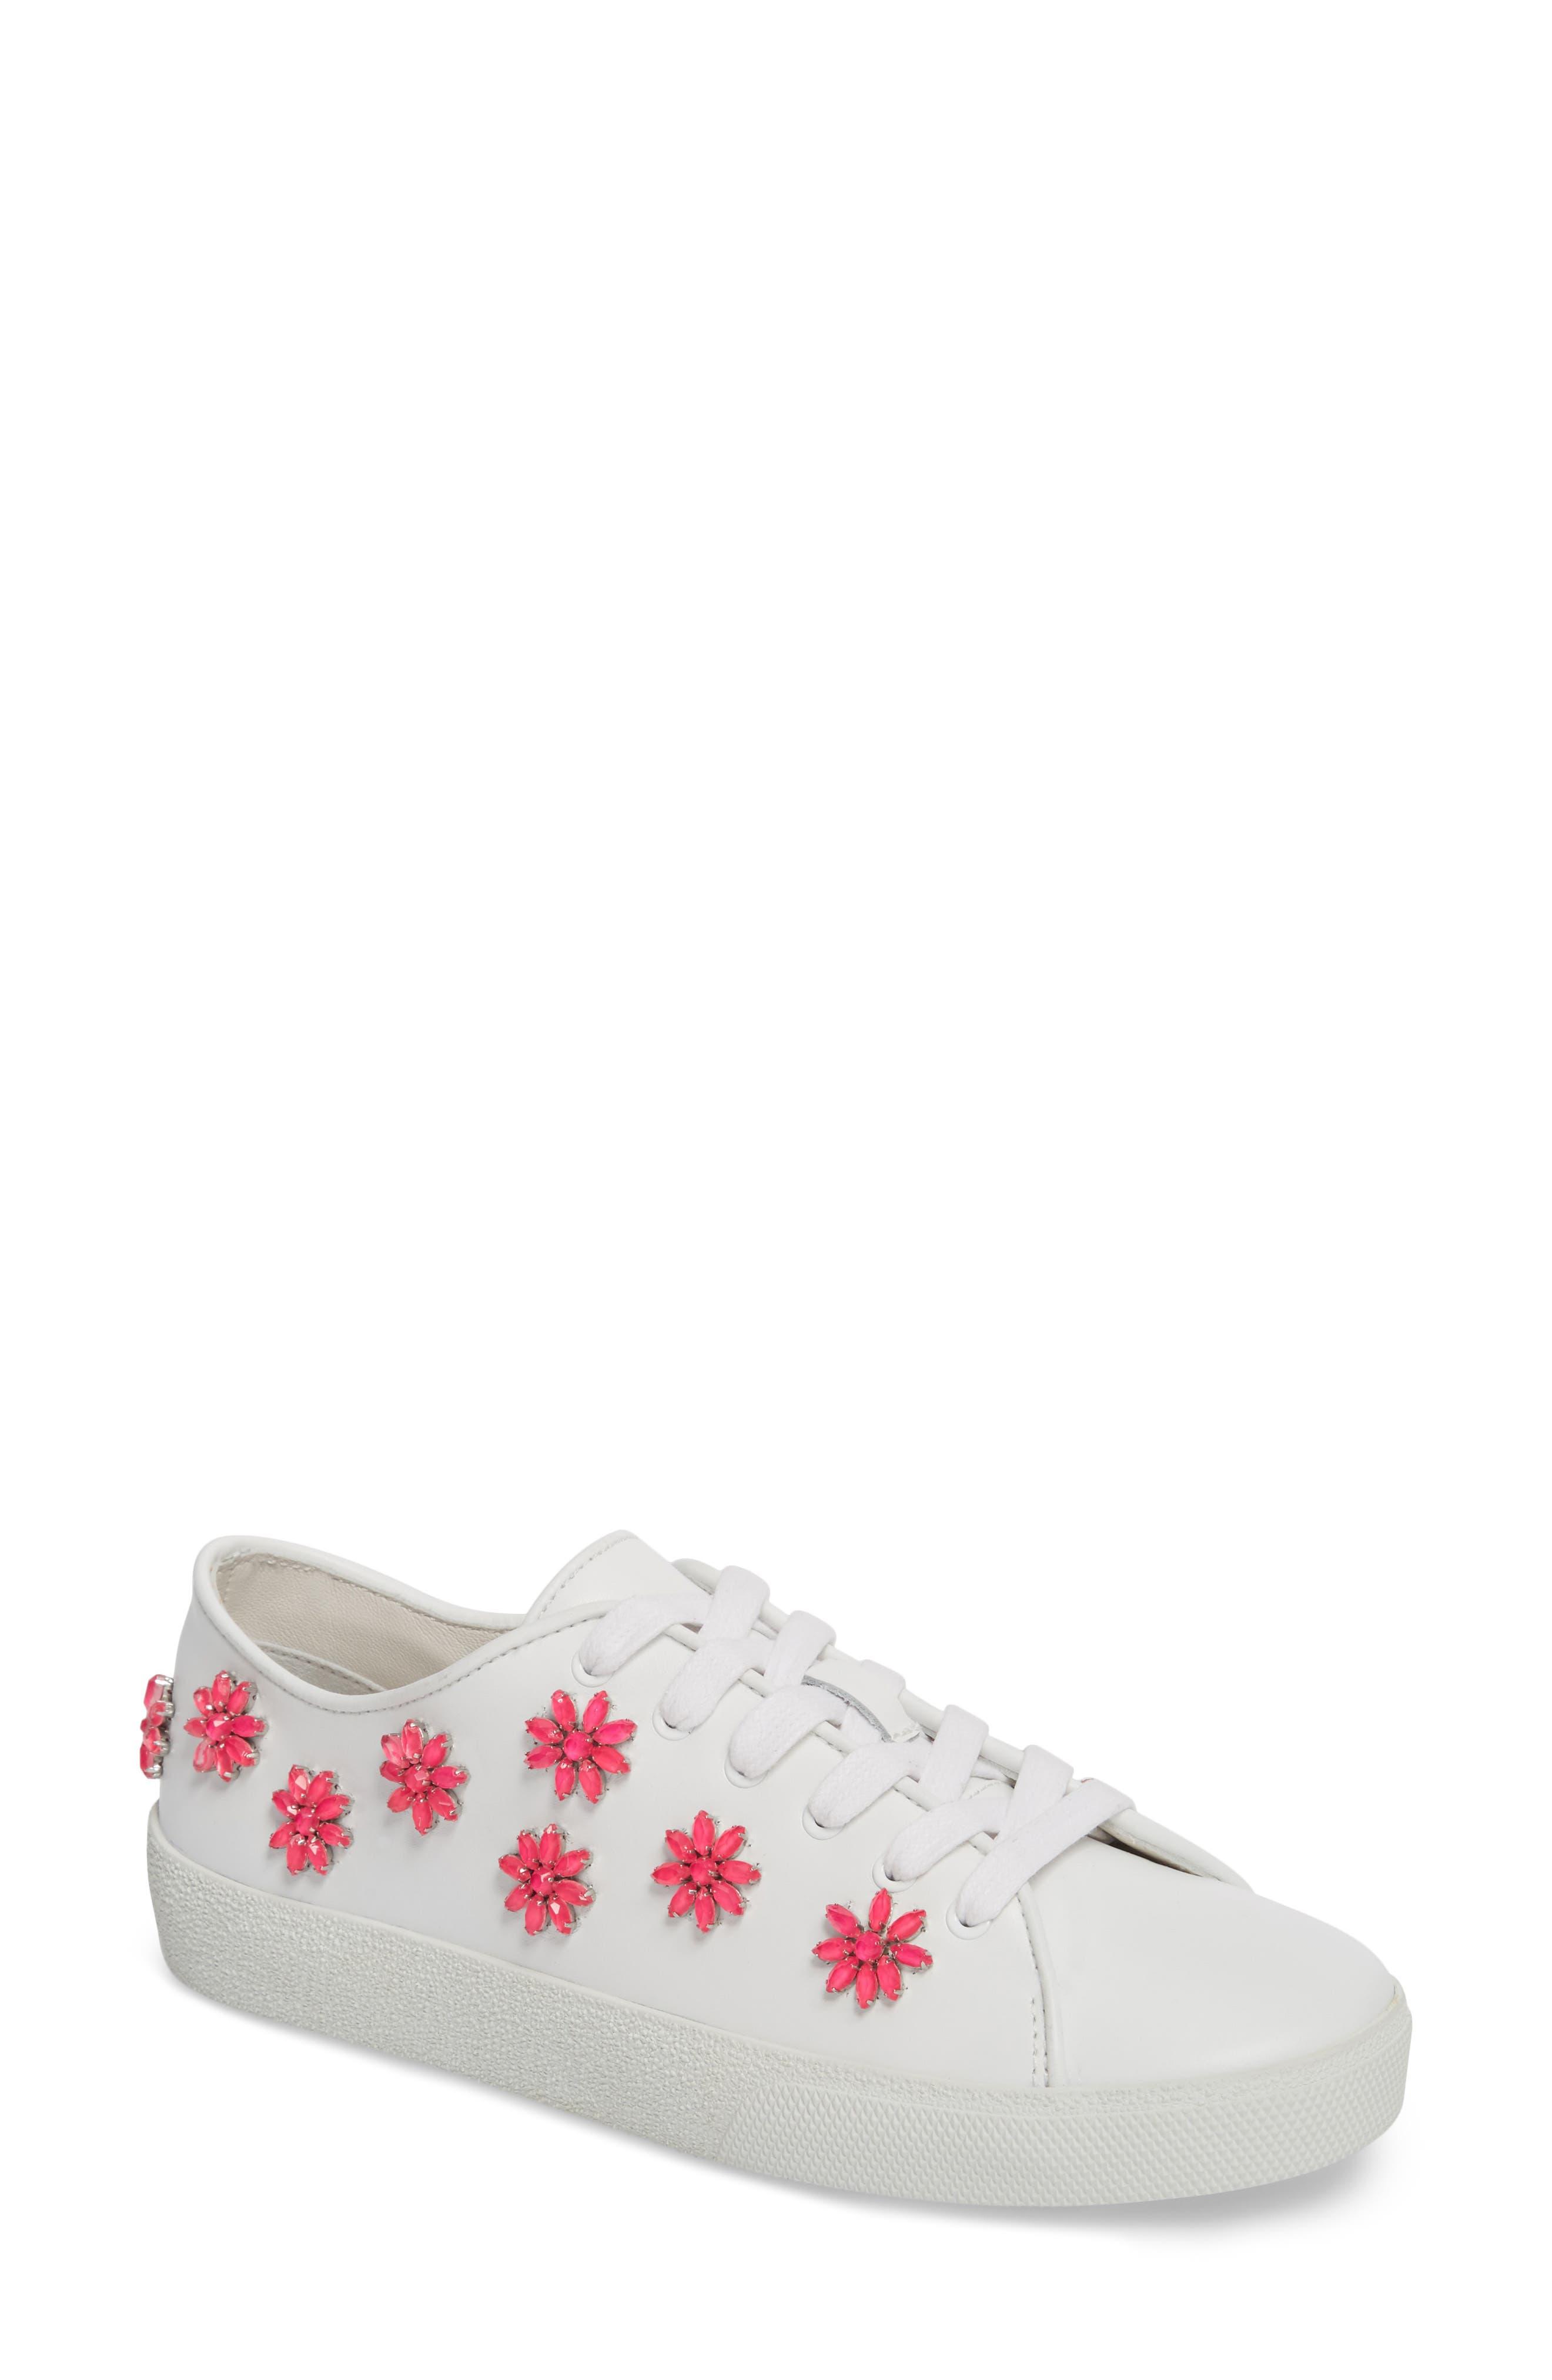 Alice + Olivia Cleo Crystal Embellished Sneaker (Women)